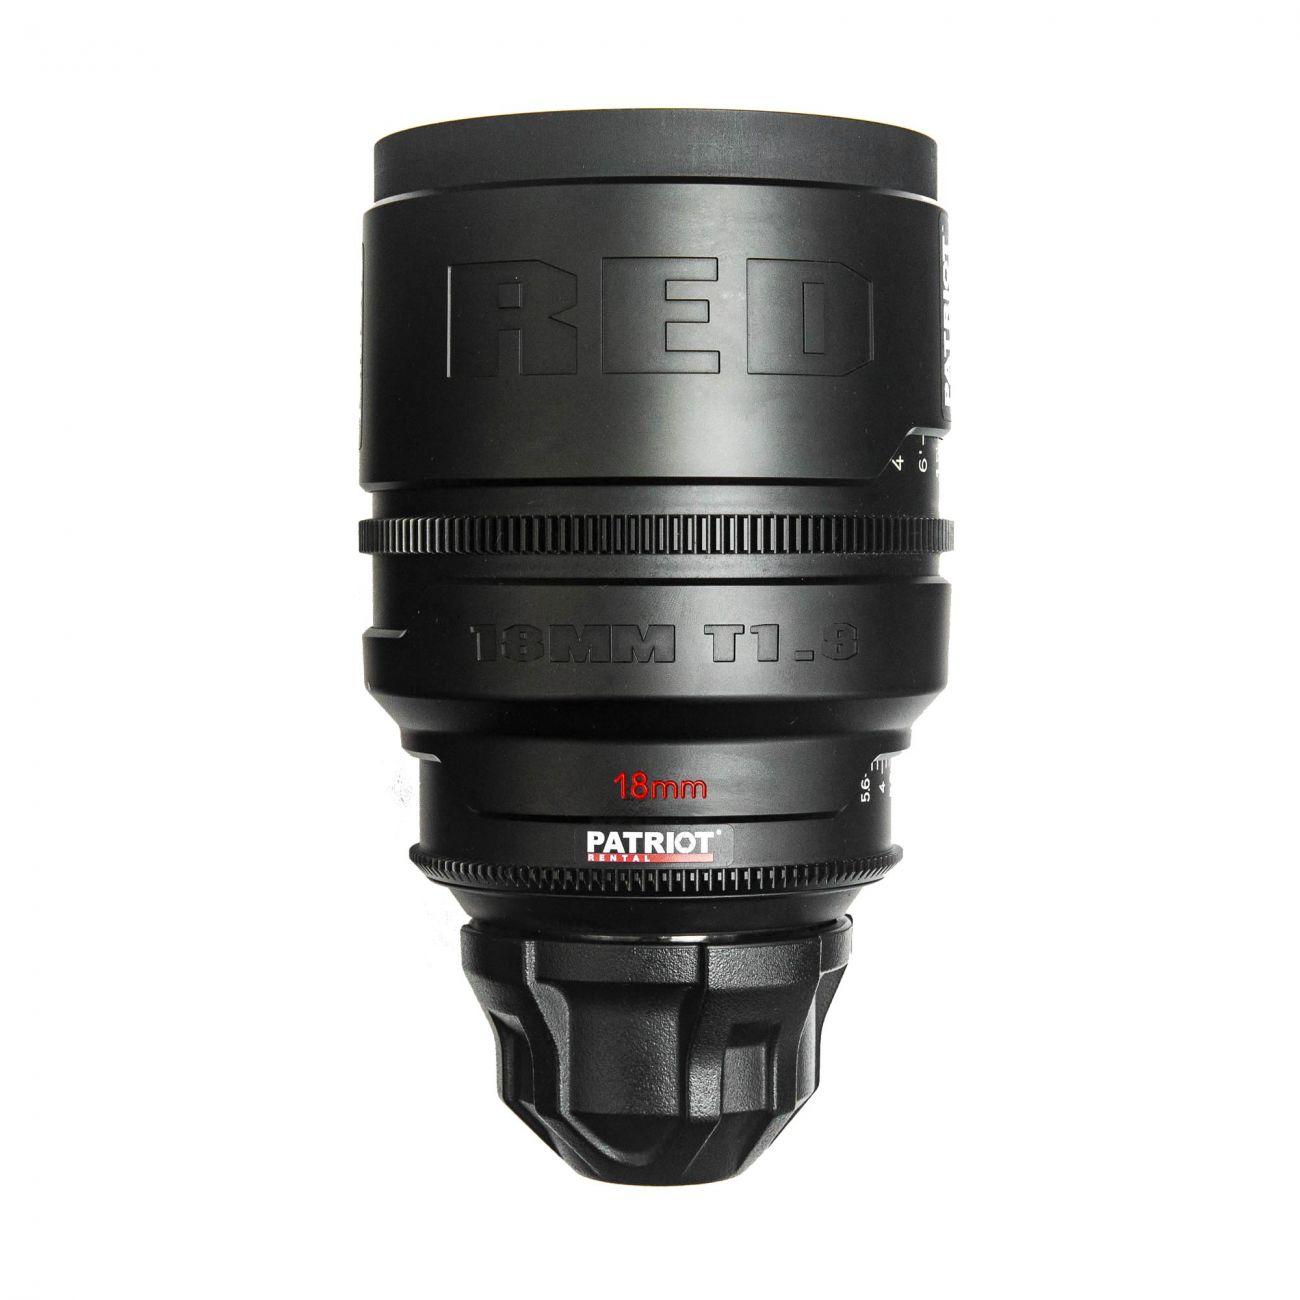 18mm RED PRO PRIME lens T1.8